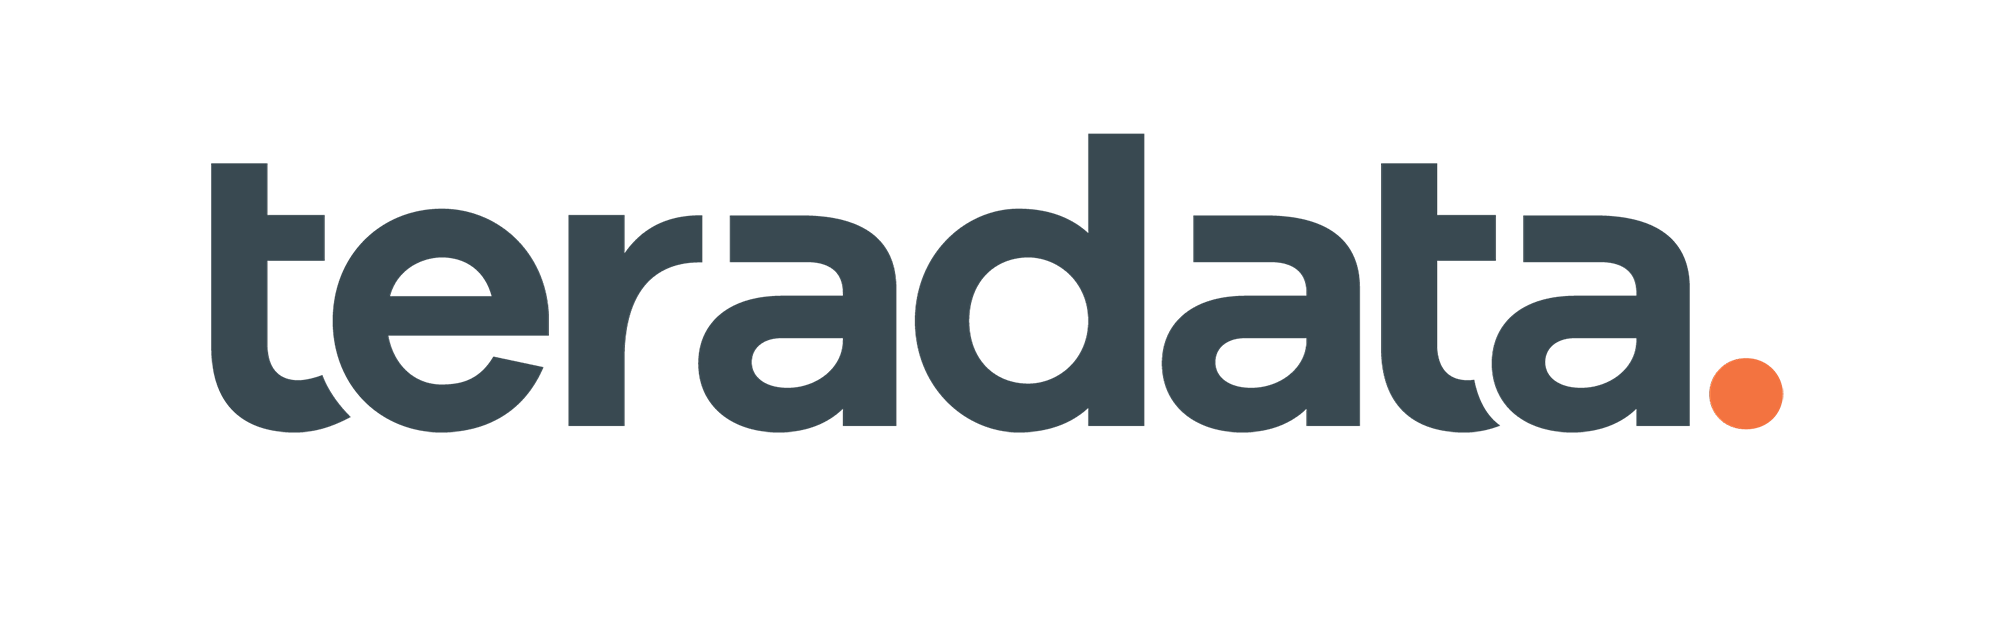 Teradata new logo